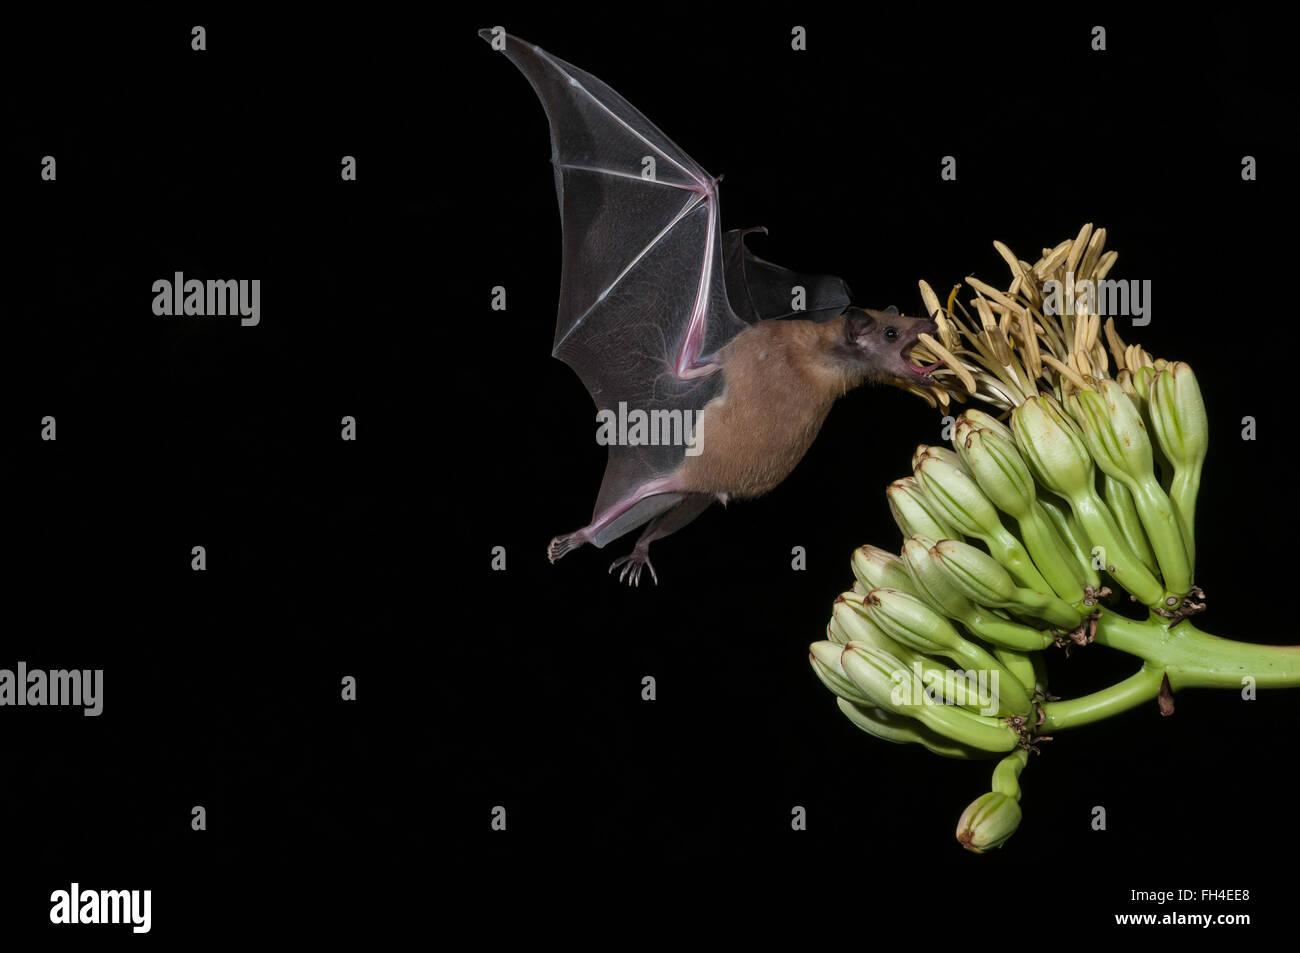 Bec long moindre bat Leptonycteris curasoae yerbabuenae, (), se nourrissant de fleurs d'agave, Green Valley, Arizona, USA Banque D'Images